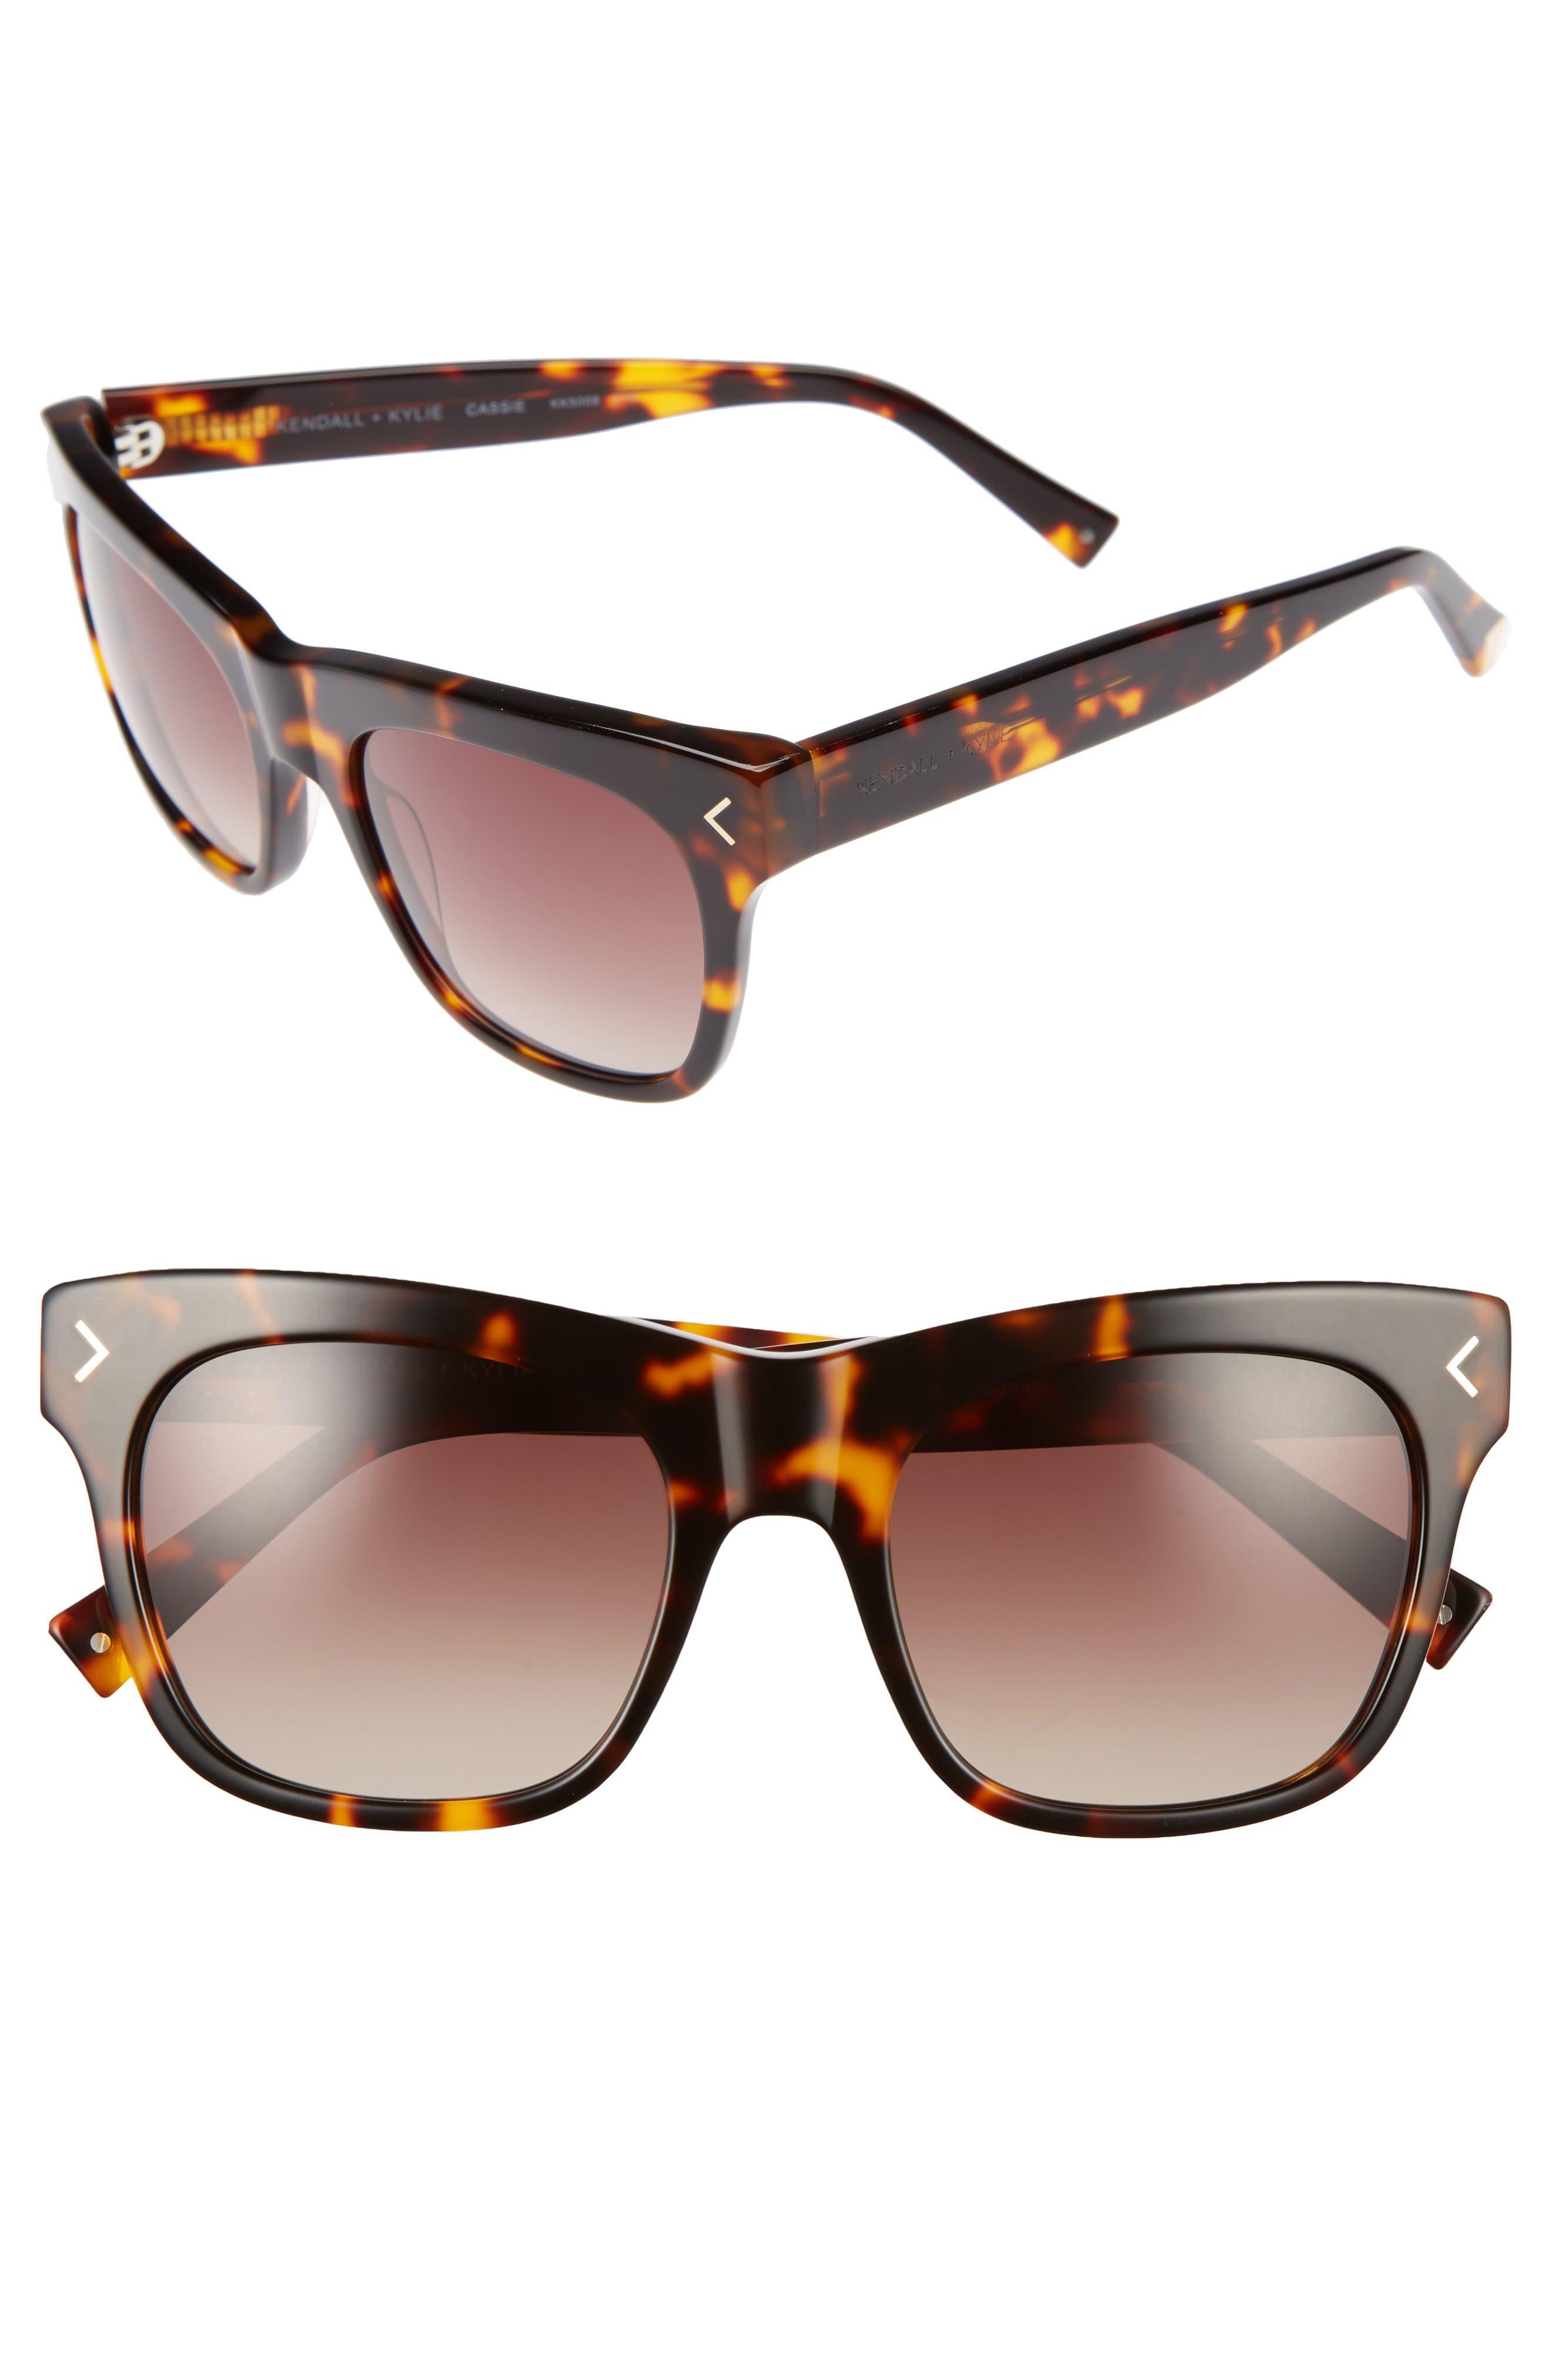 KENDALL + KYLIE Cassie 54mm Sunglasses